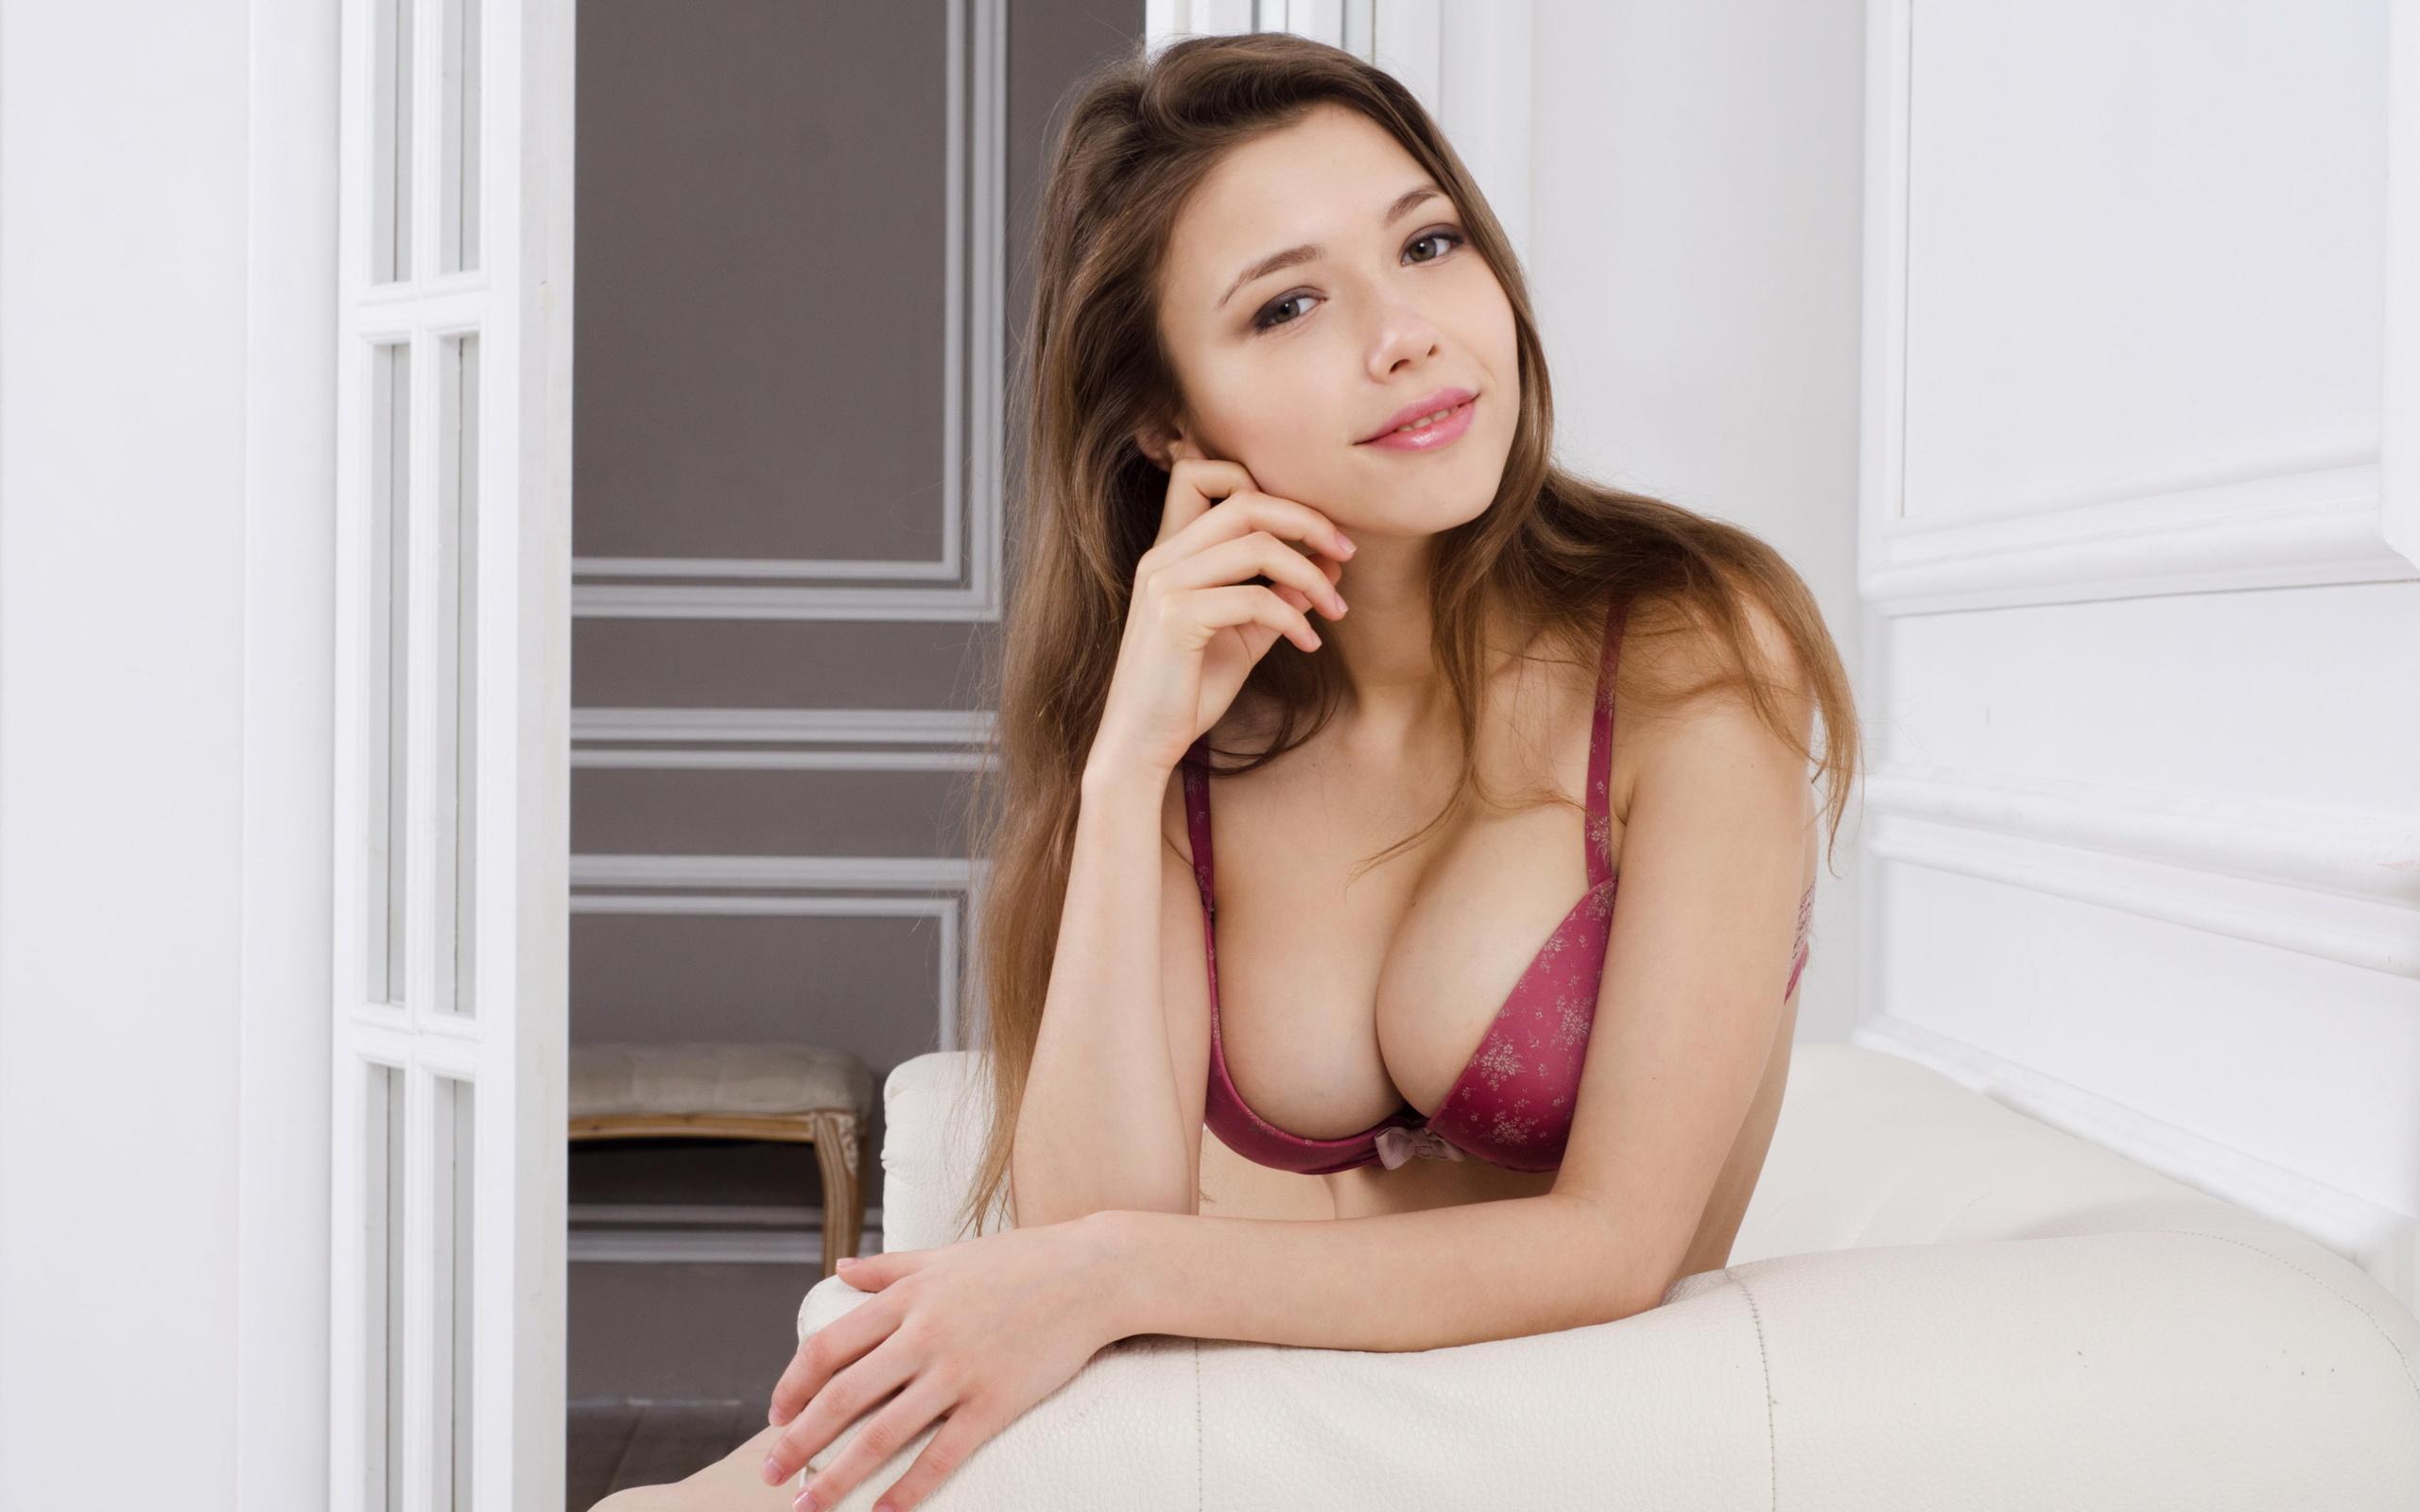 Vanessa williams nude sex scenes